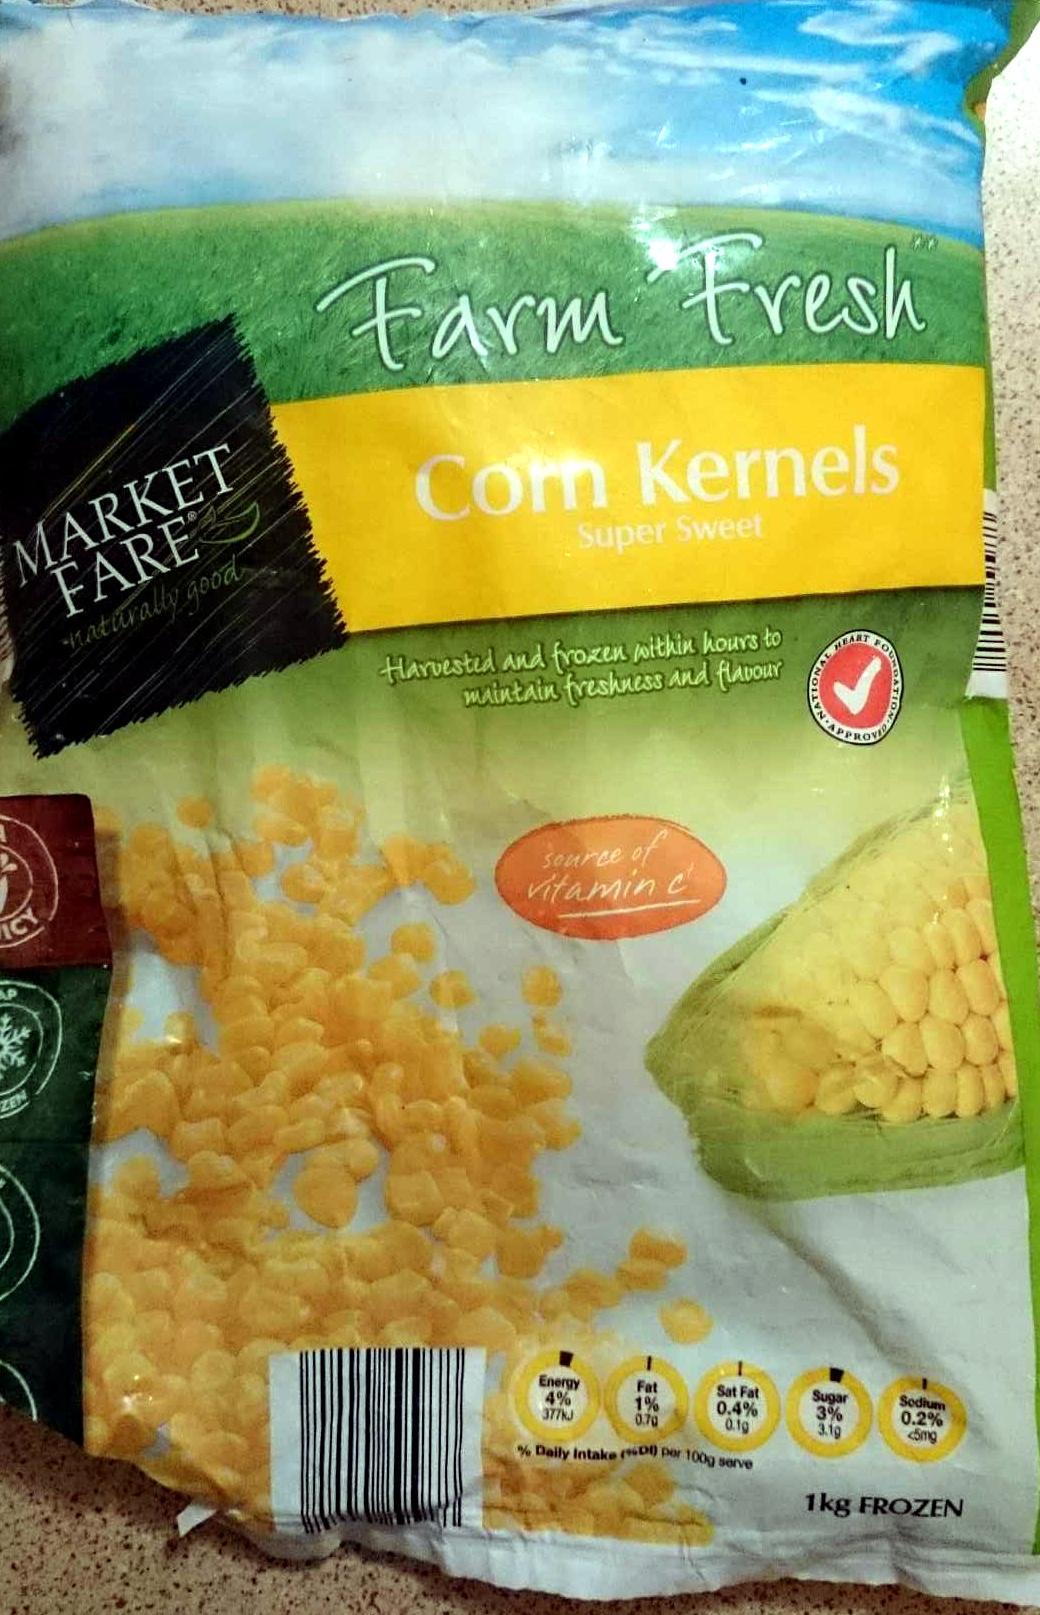 Farm Fresh Corn Kernels - Produit - en